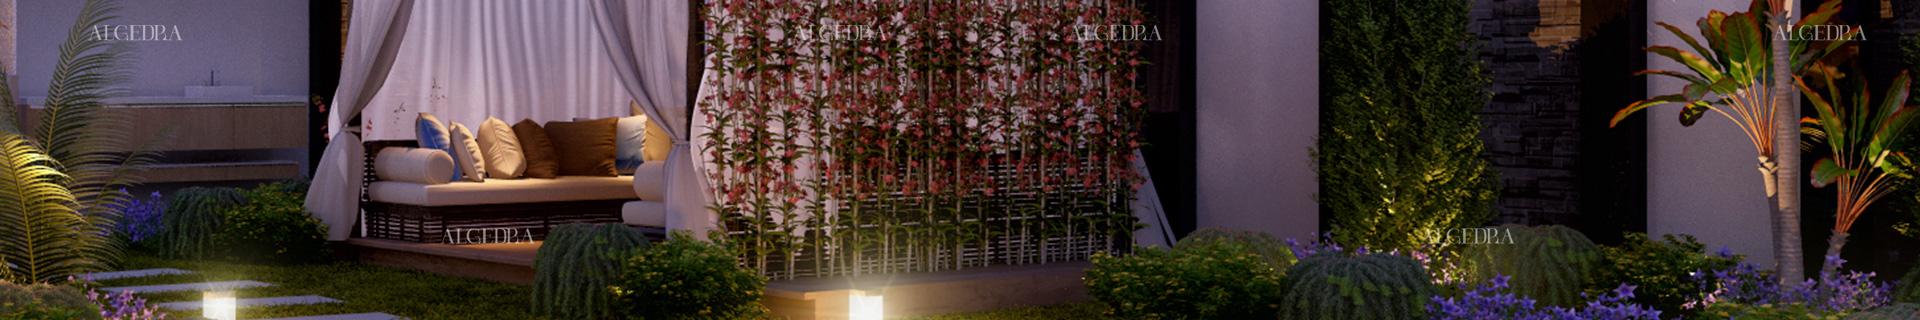 Landscape Designs Dubai